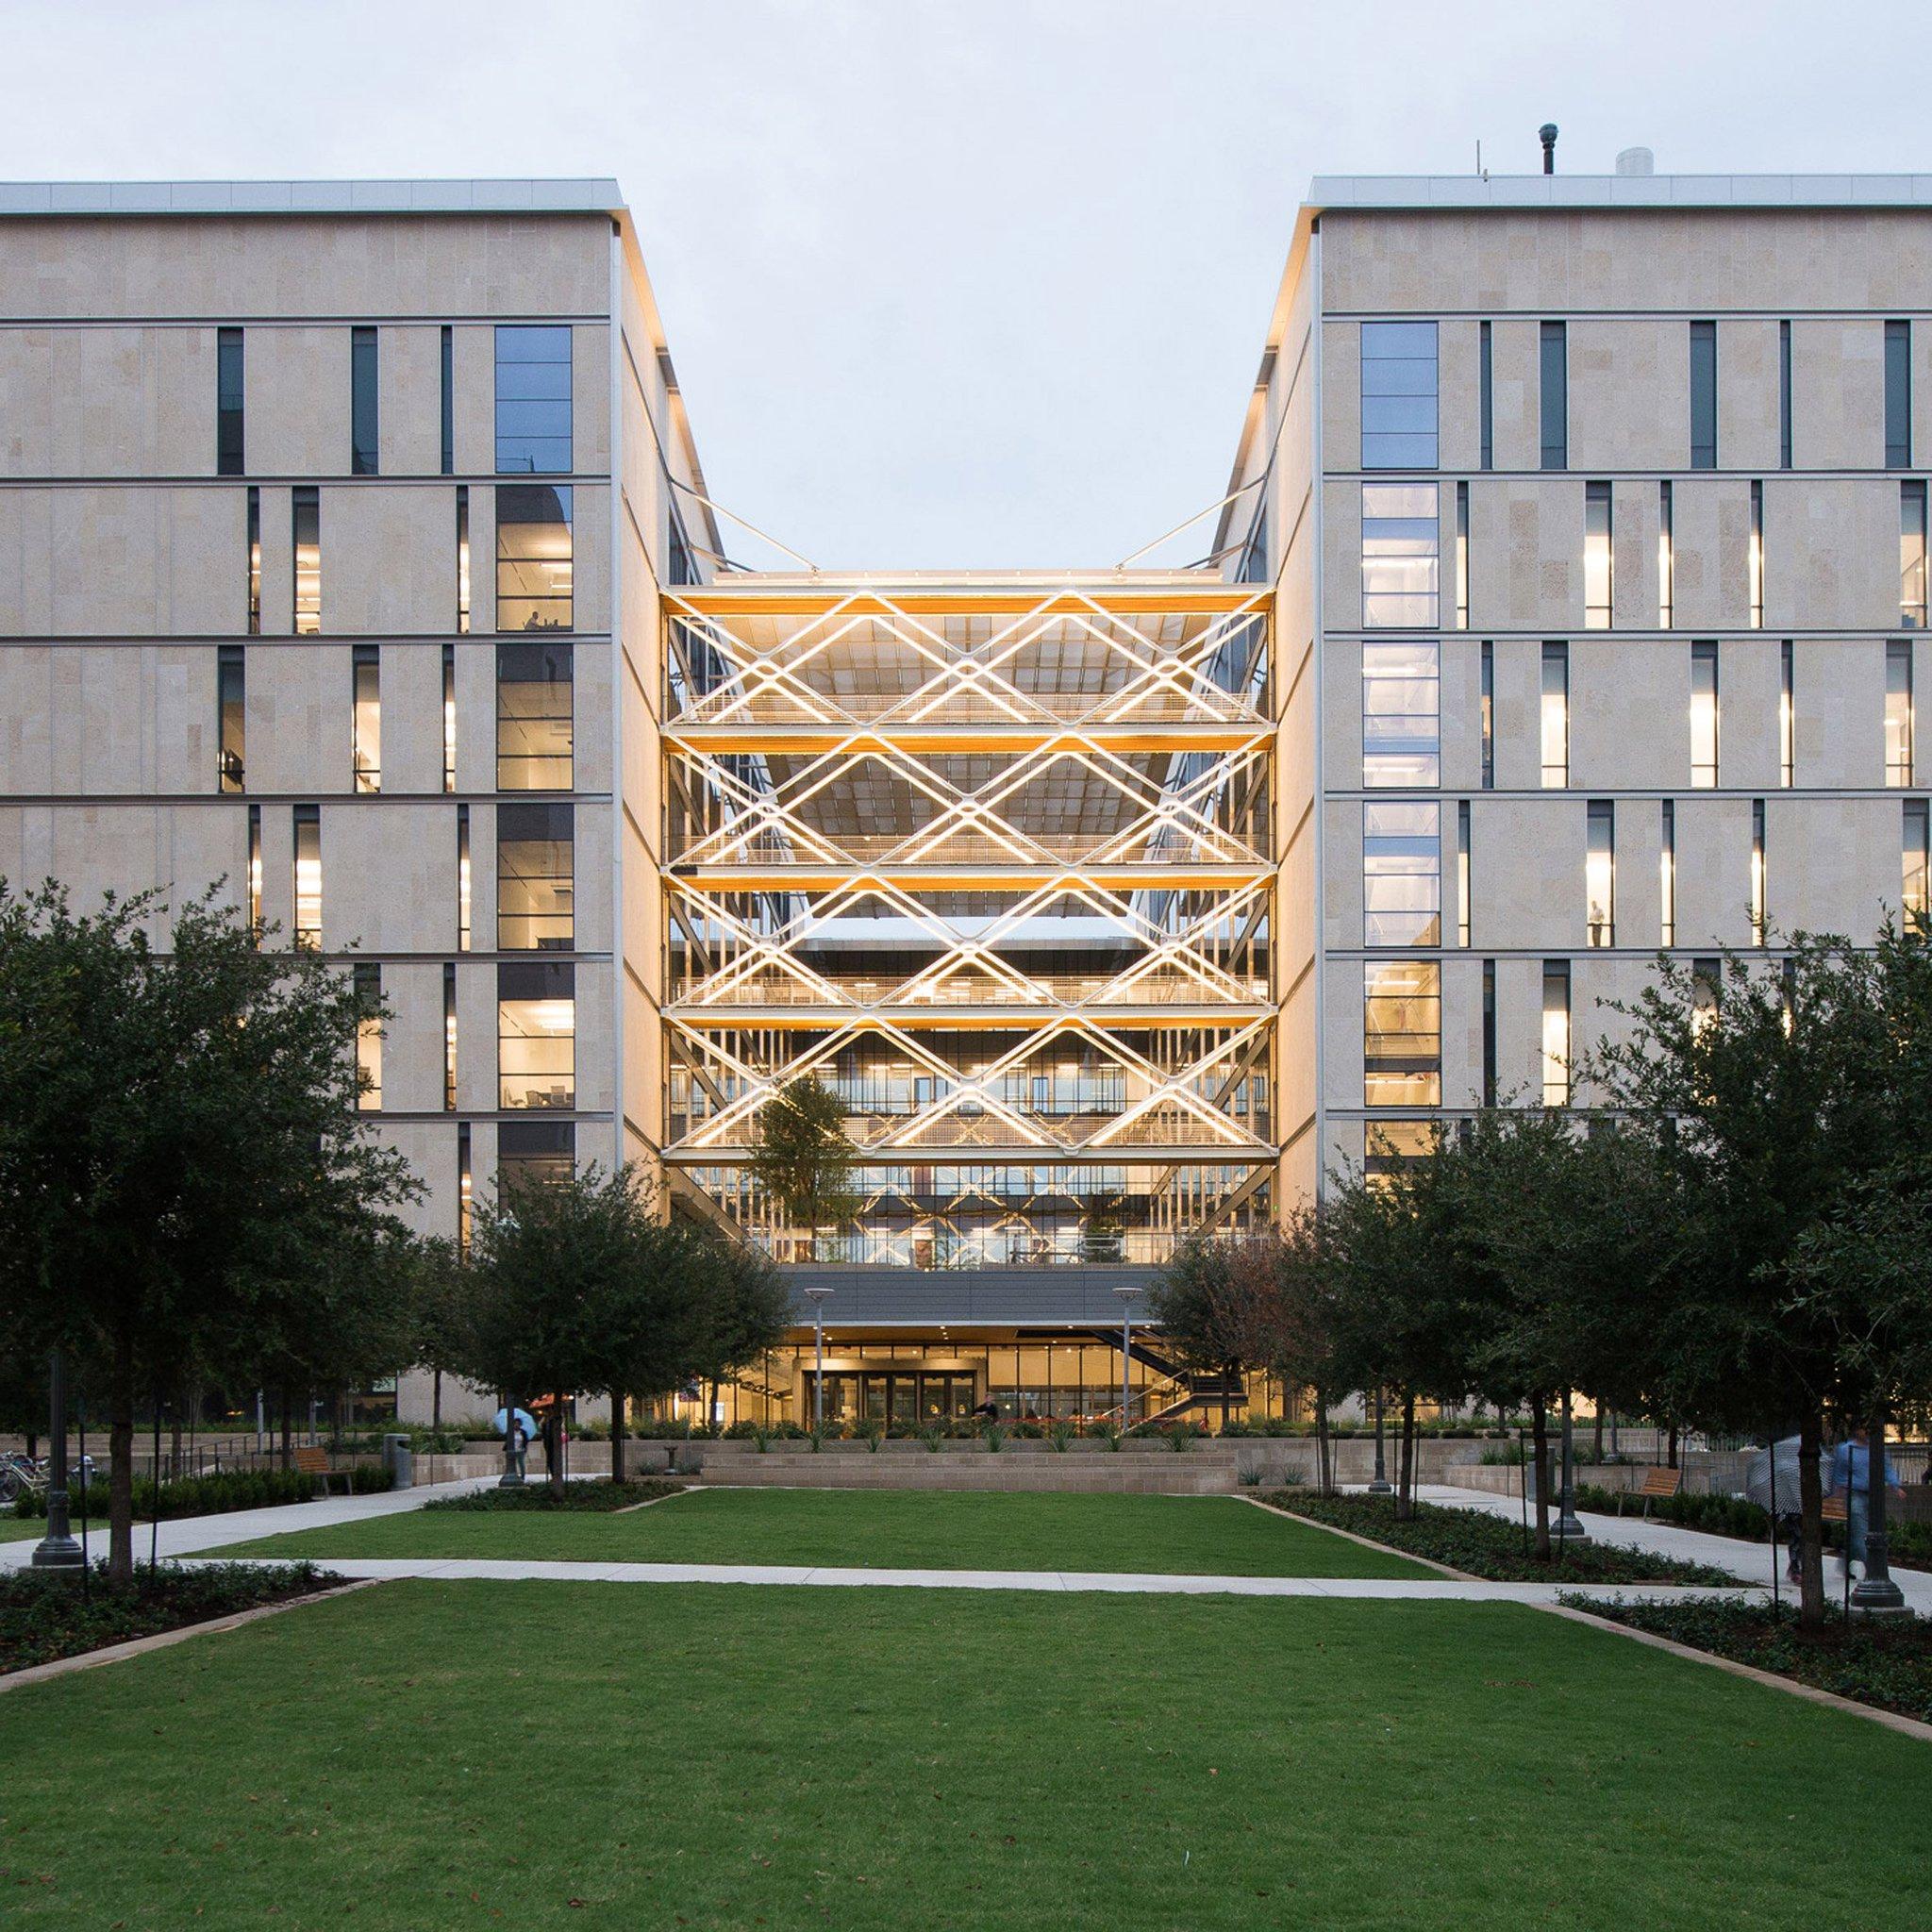 Giant metal lattice fronts atrium of Texas engineering school by Ennead https://t.co/xq7GFnpyjC https://t.co/QfCWYXLjuV